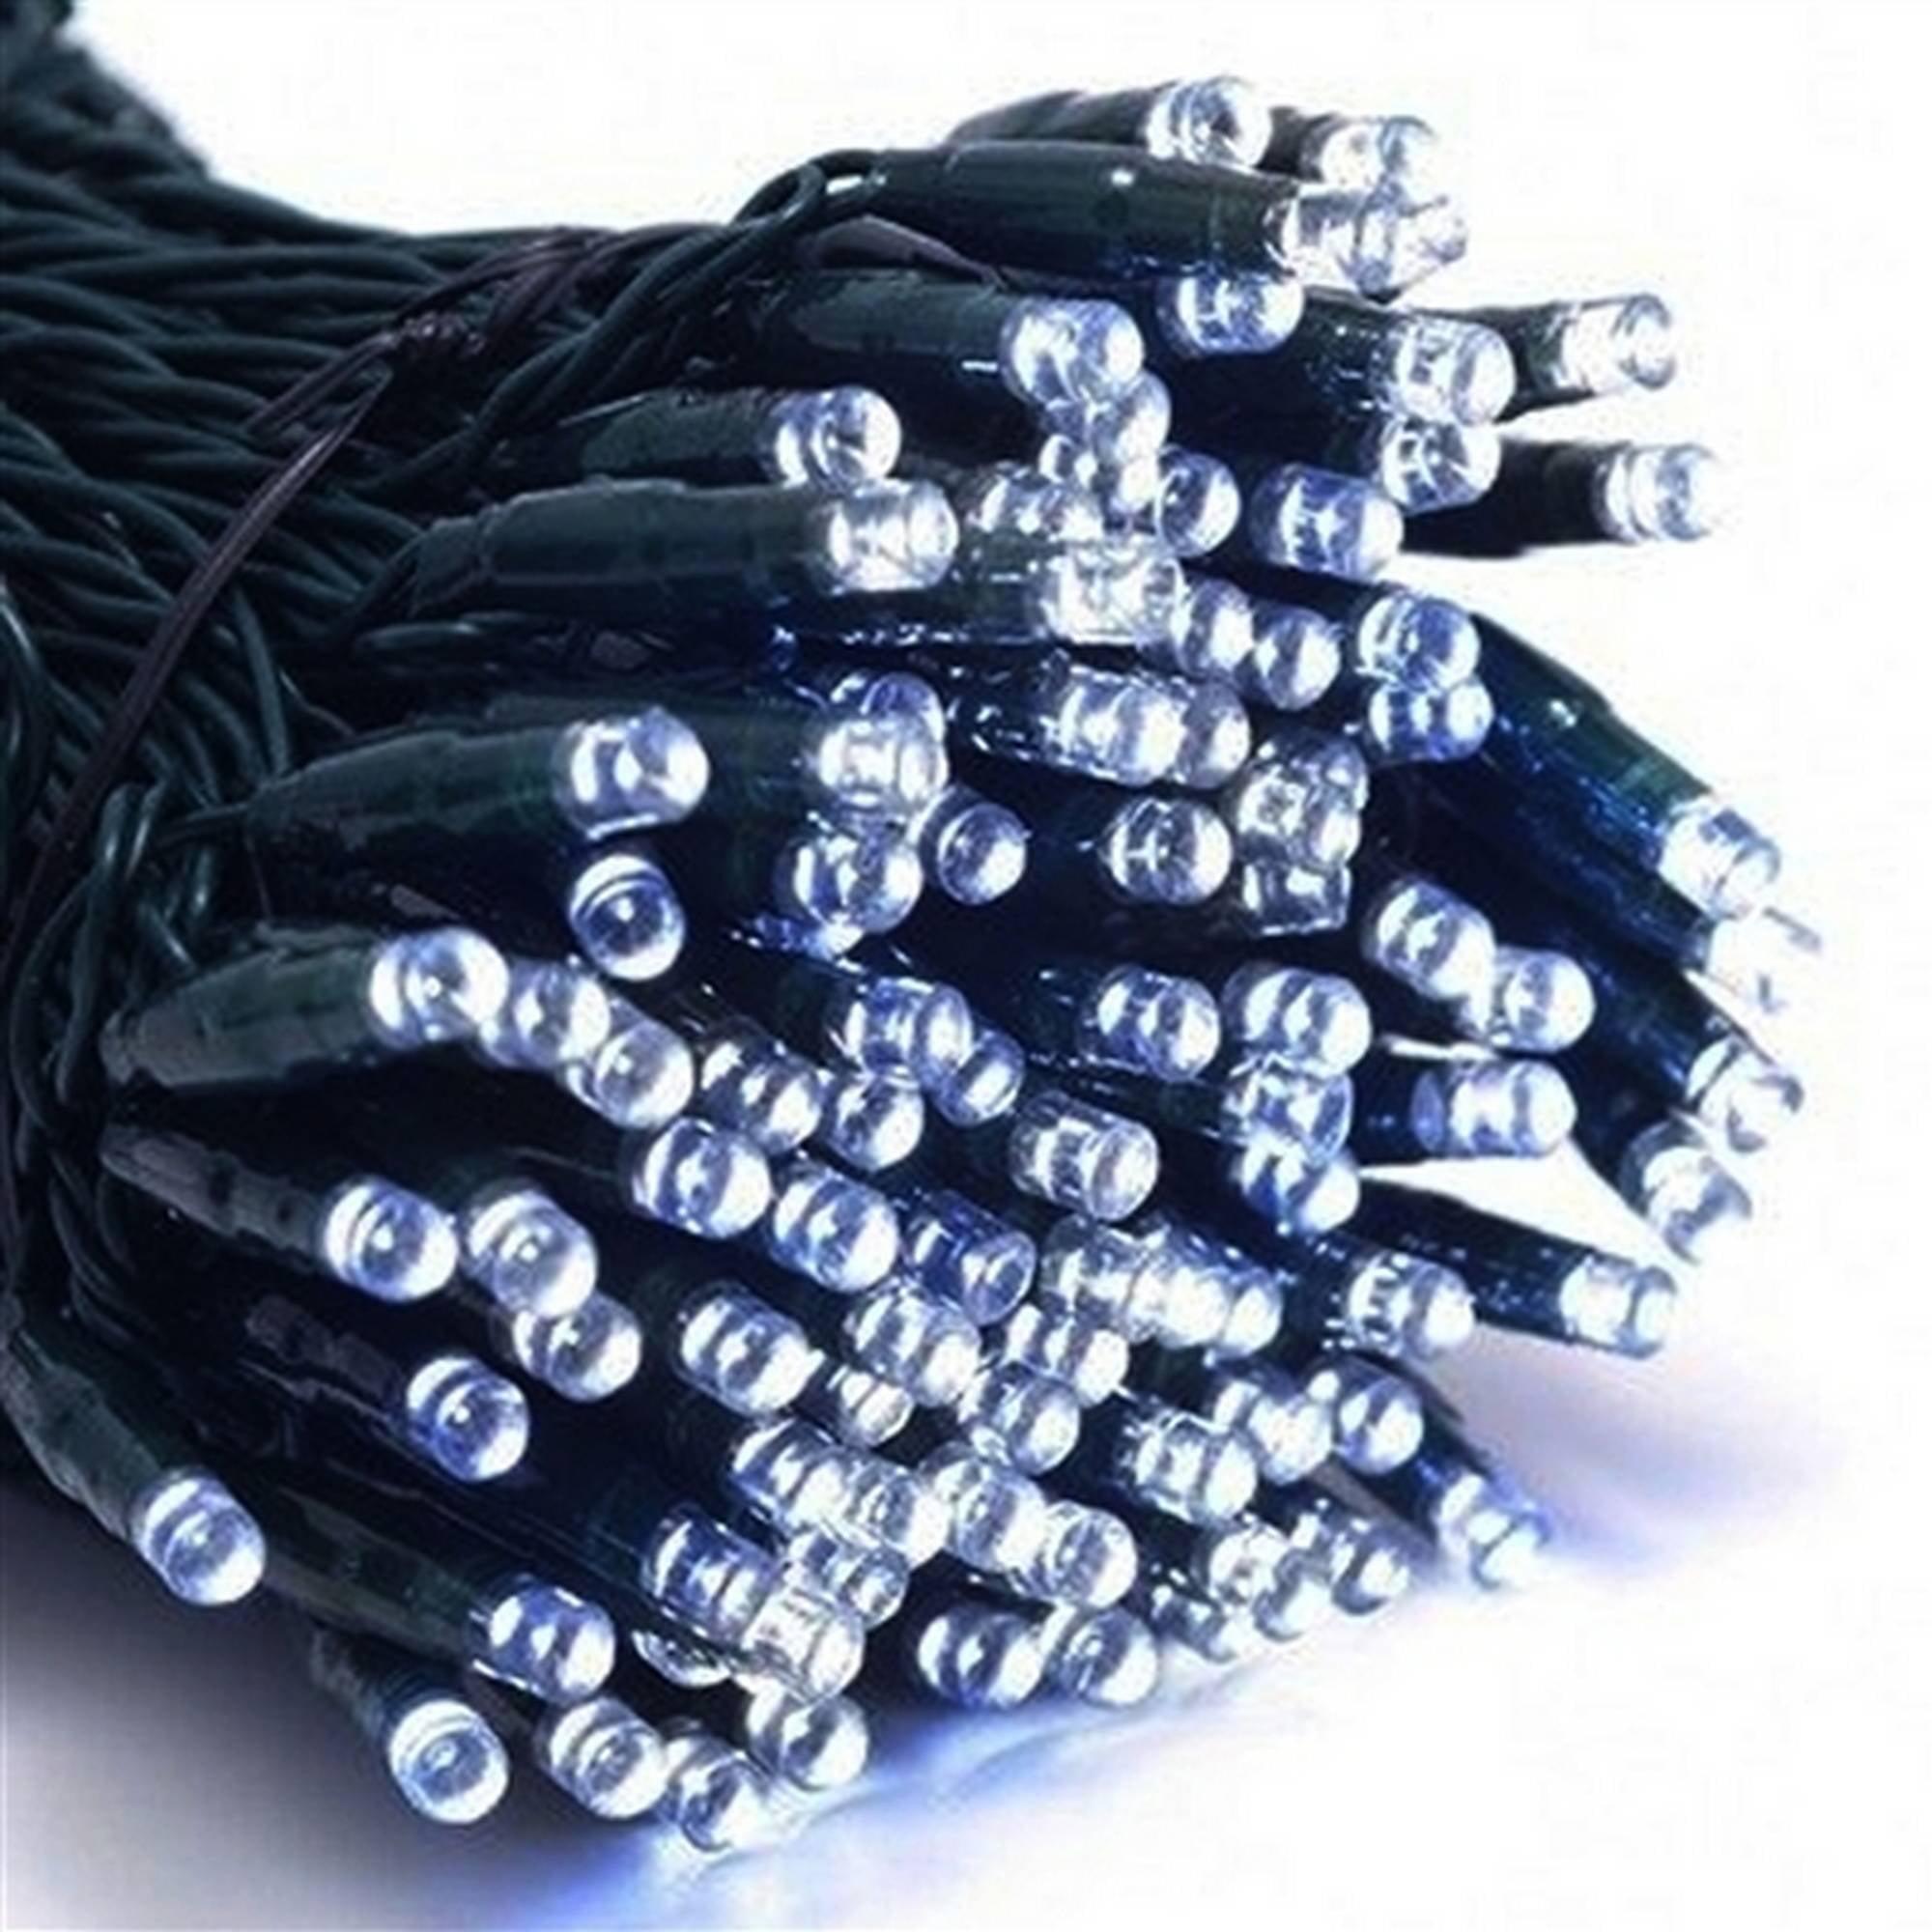 ALEKO 40 LED Battery Operated Christmas String Lights, Warm White